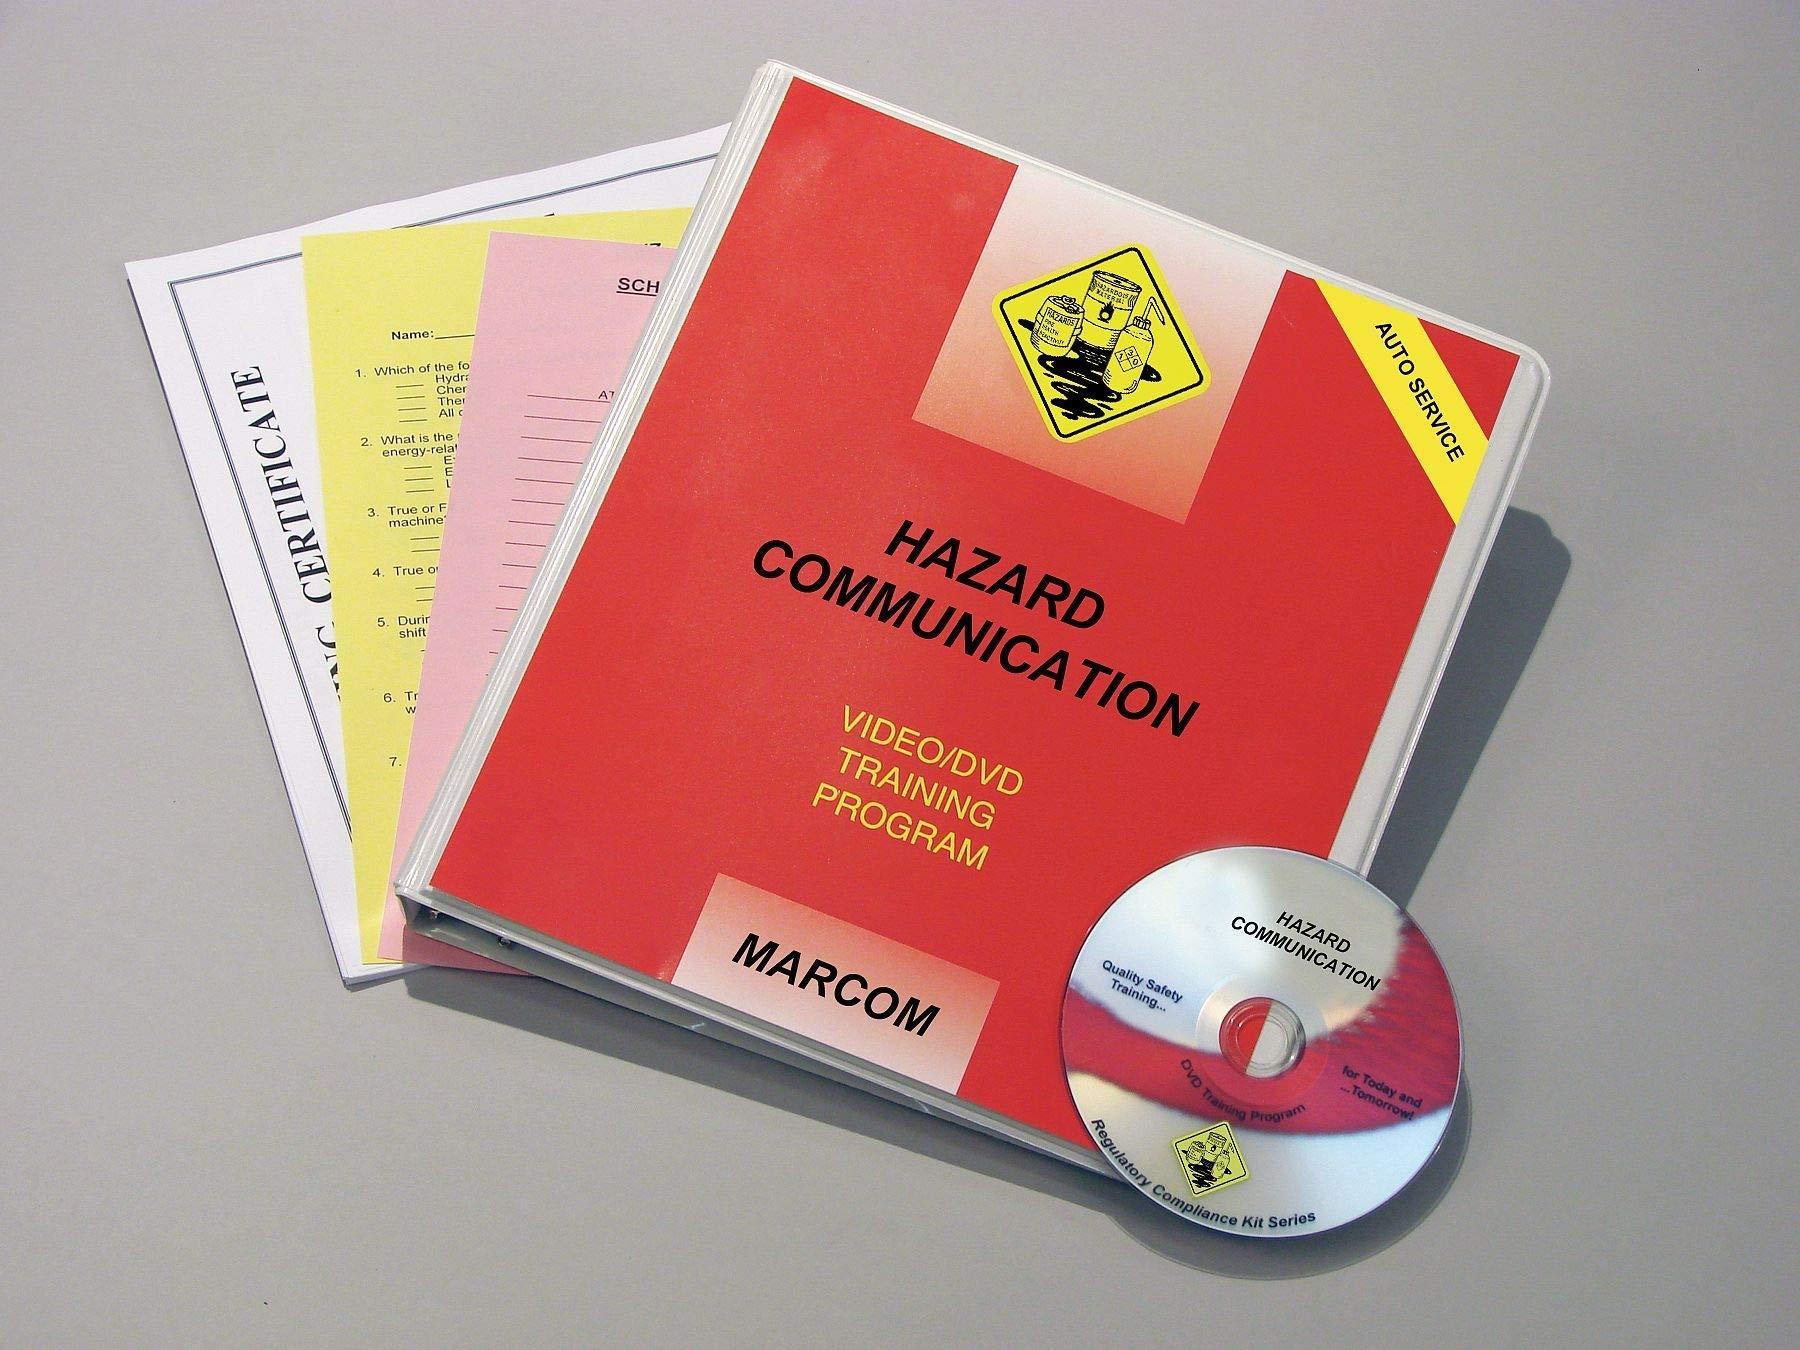 Marcom Training DVD, Hazard Communication - V0001679EO